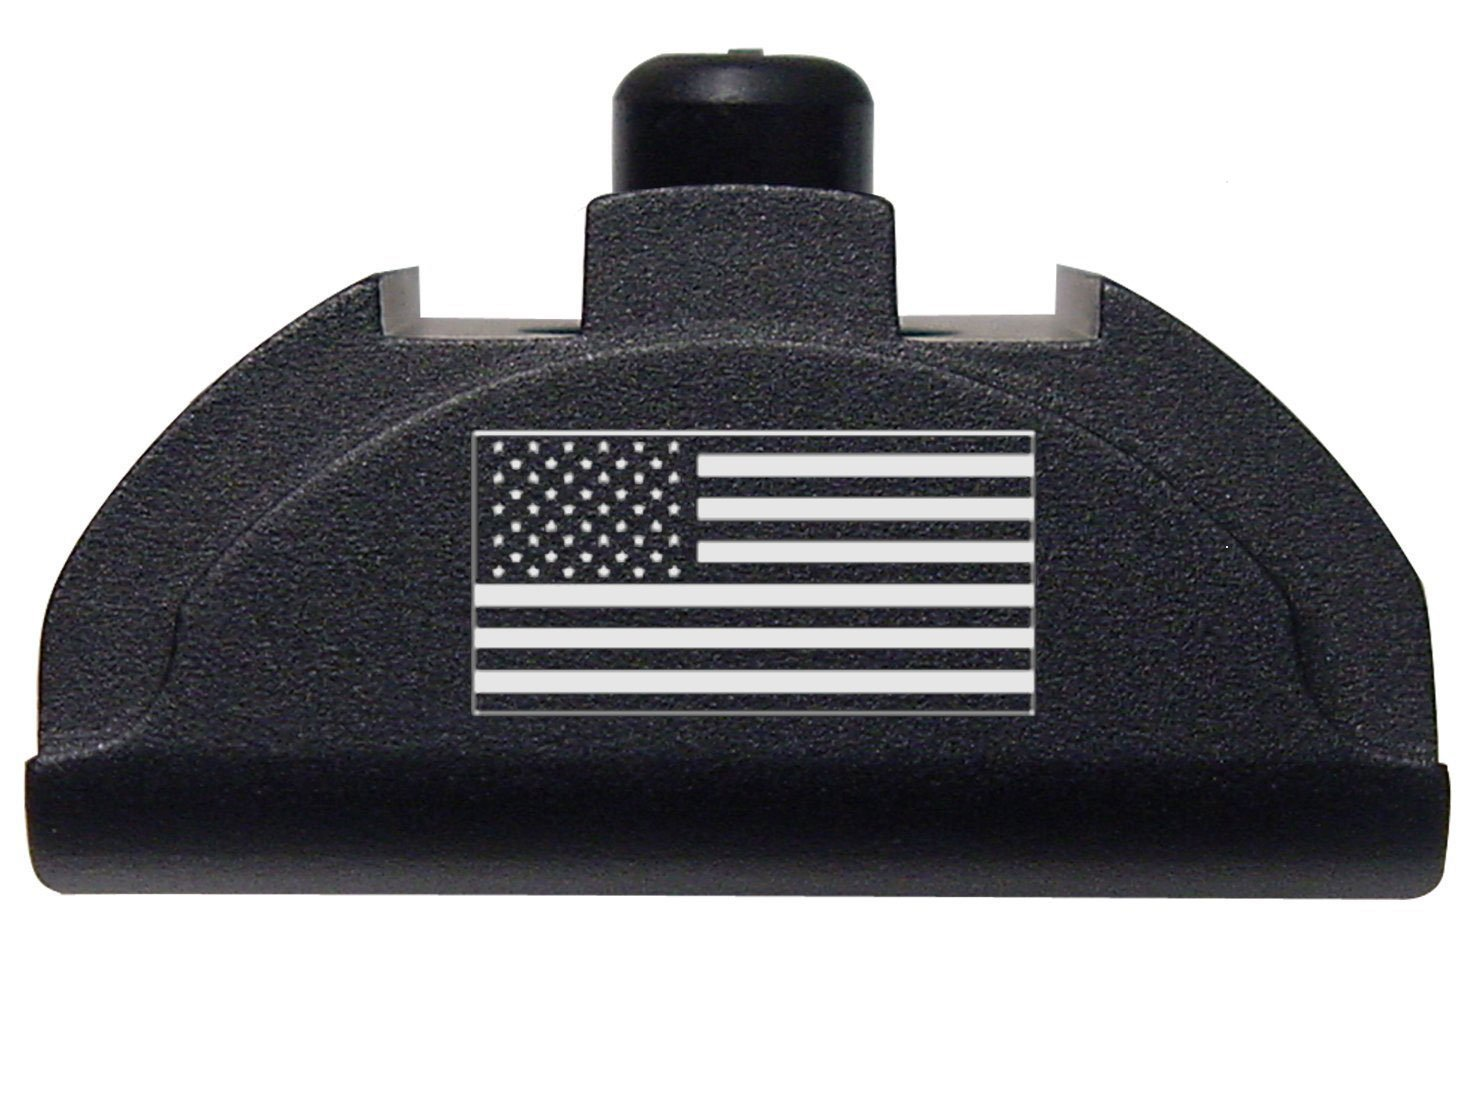 Fixxxer Gen 4 - 5 Aluminum Grip Frame Plug for Glock 17 18 19 22 23 24 25 31 32 34 35 37 38 (American Flag)